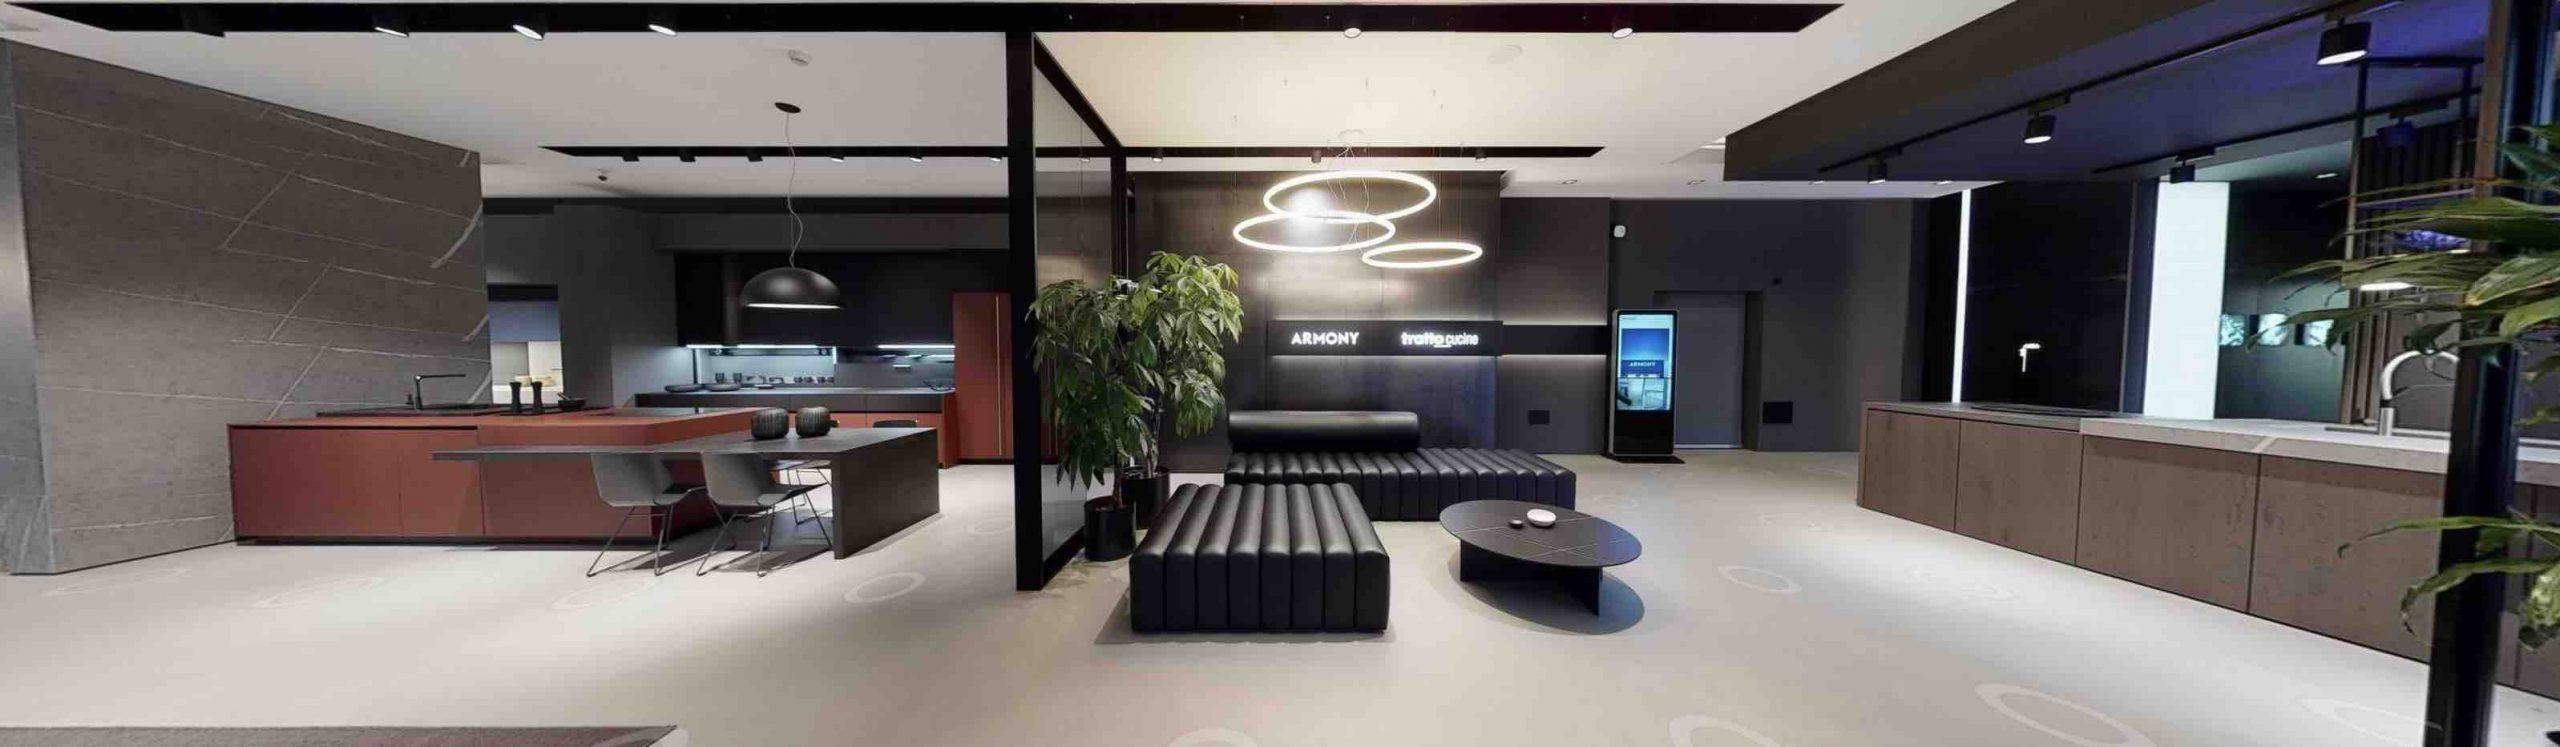 showroom bandeau